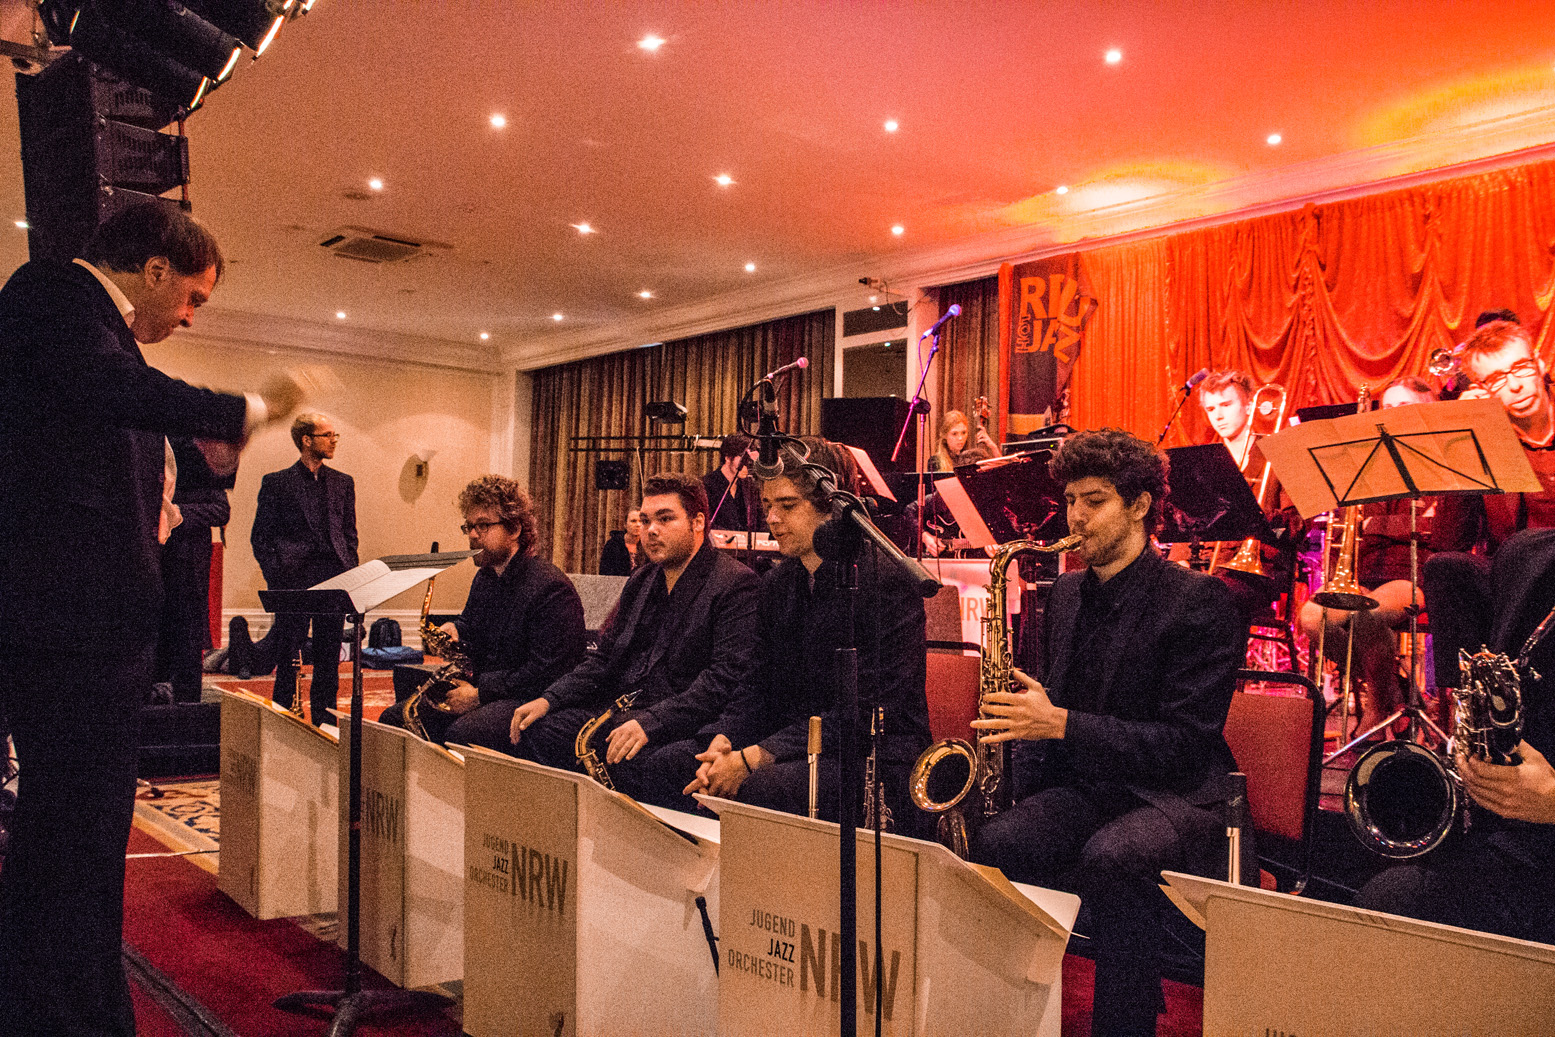 Jugend jazz orchester nrw at cork jazz festival